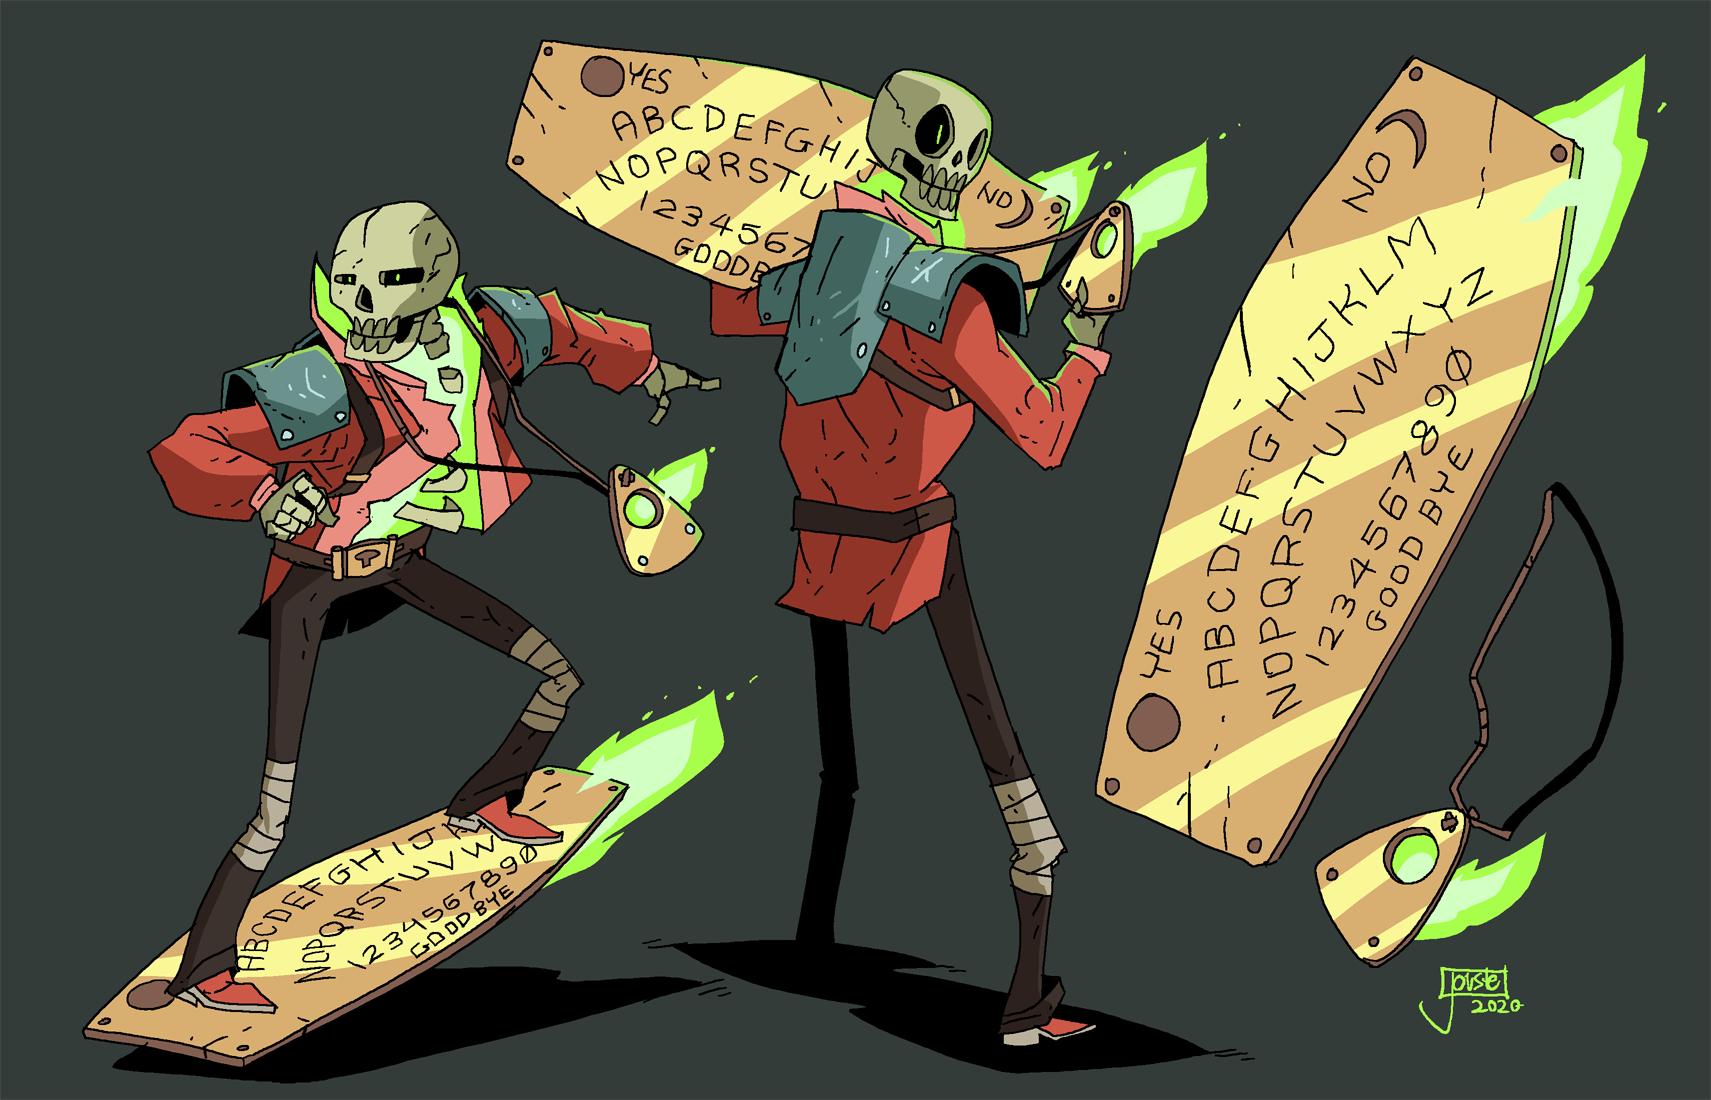 The Ouija boarder